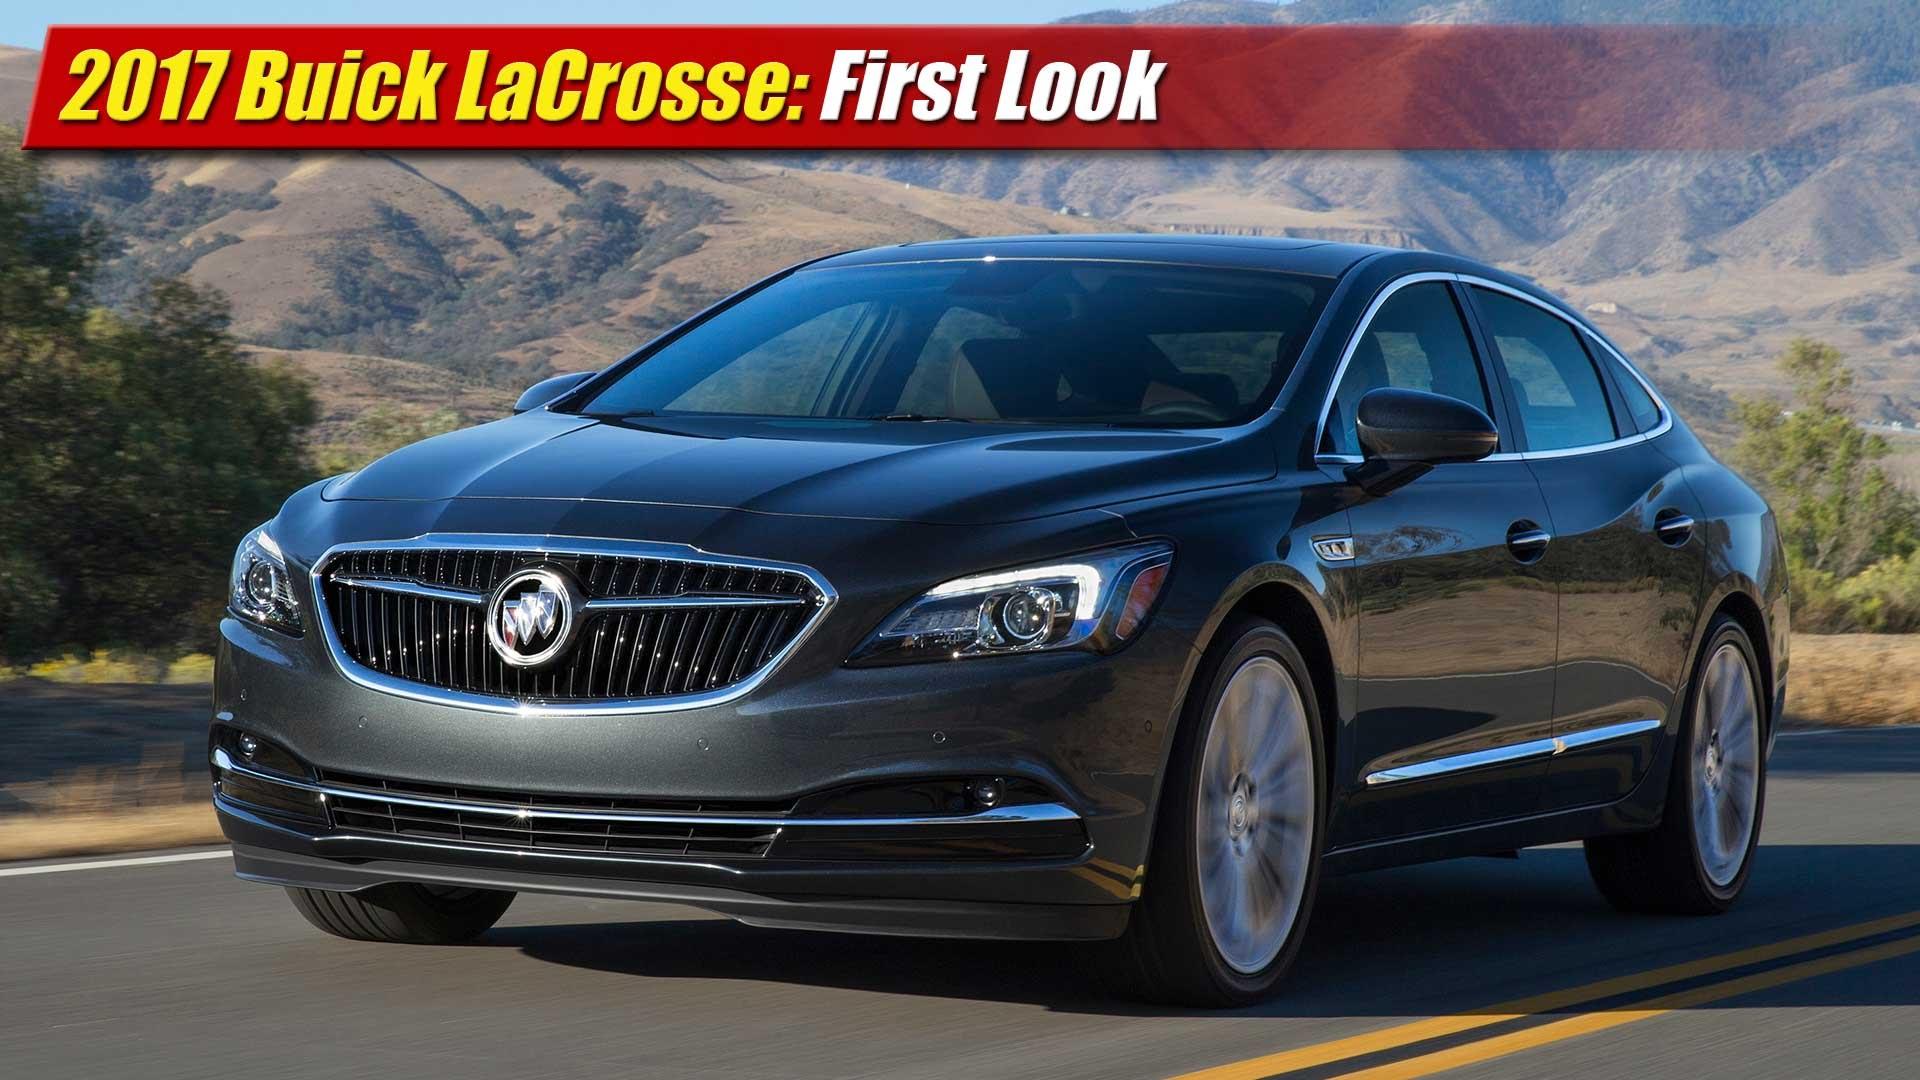 Amazing First Look 2017 Buick LaCrosse  TestDrivenTV